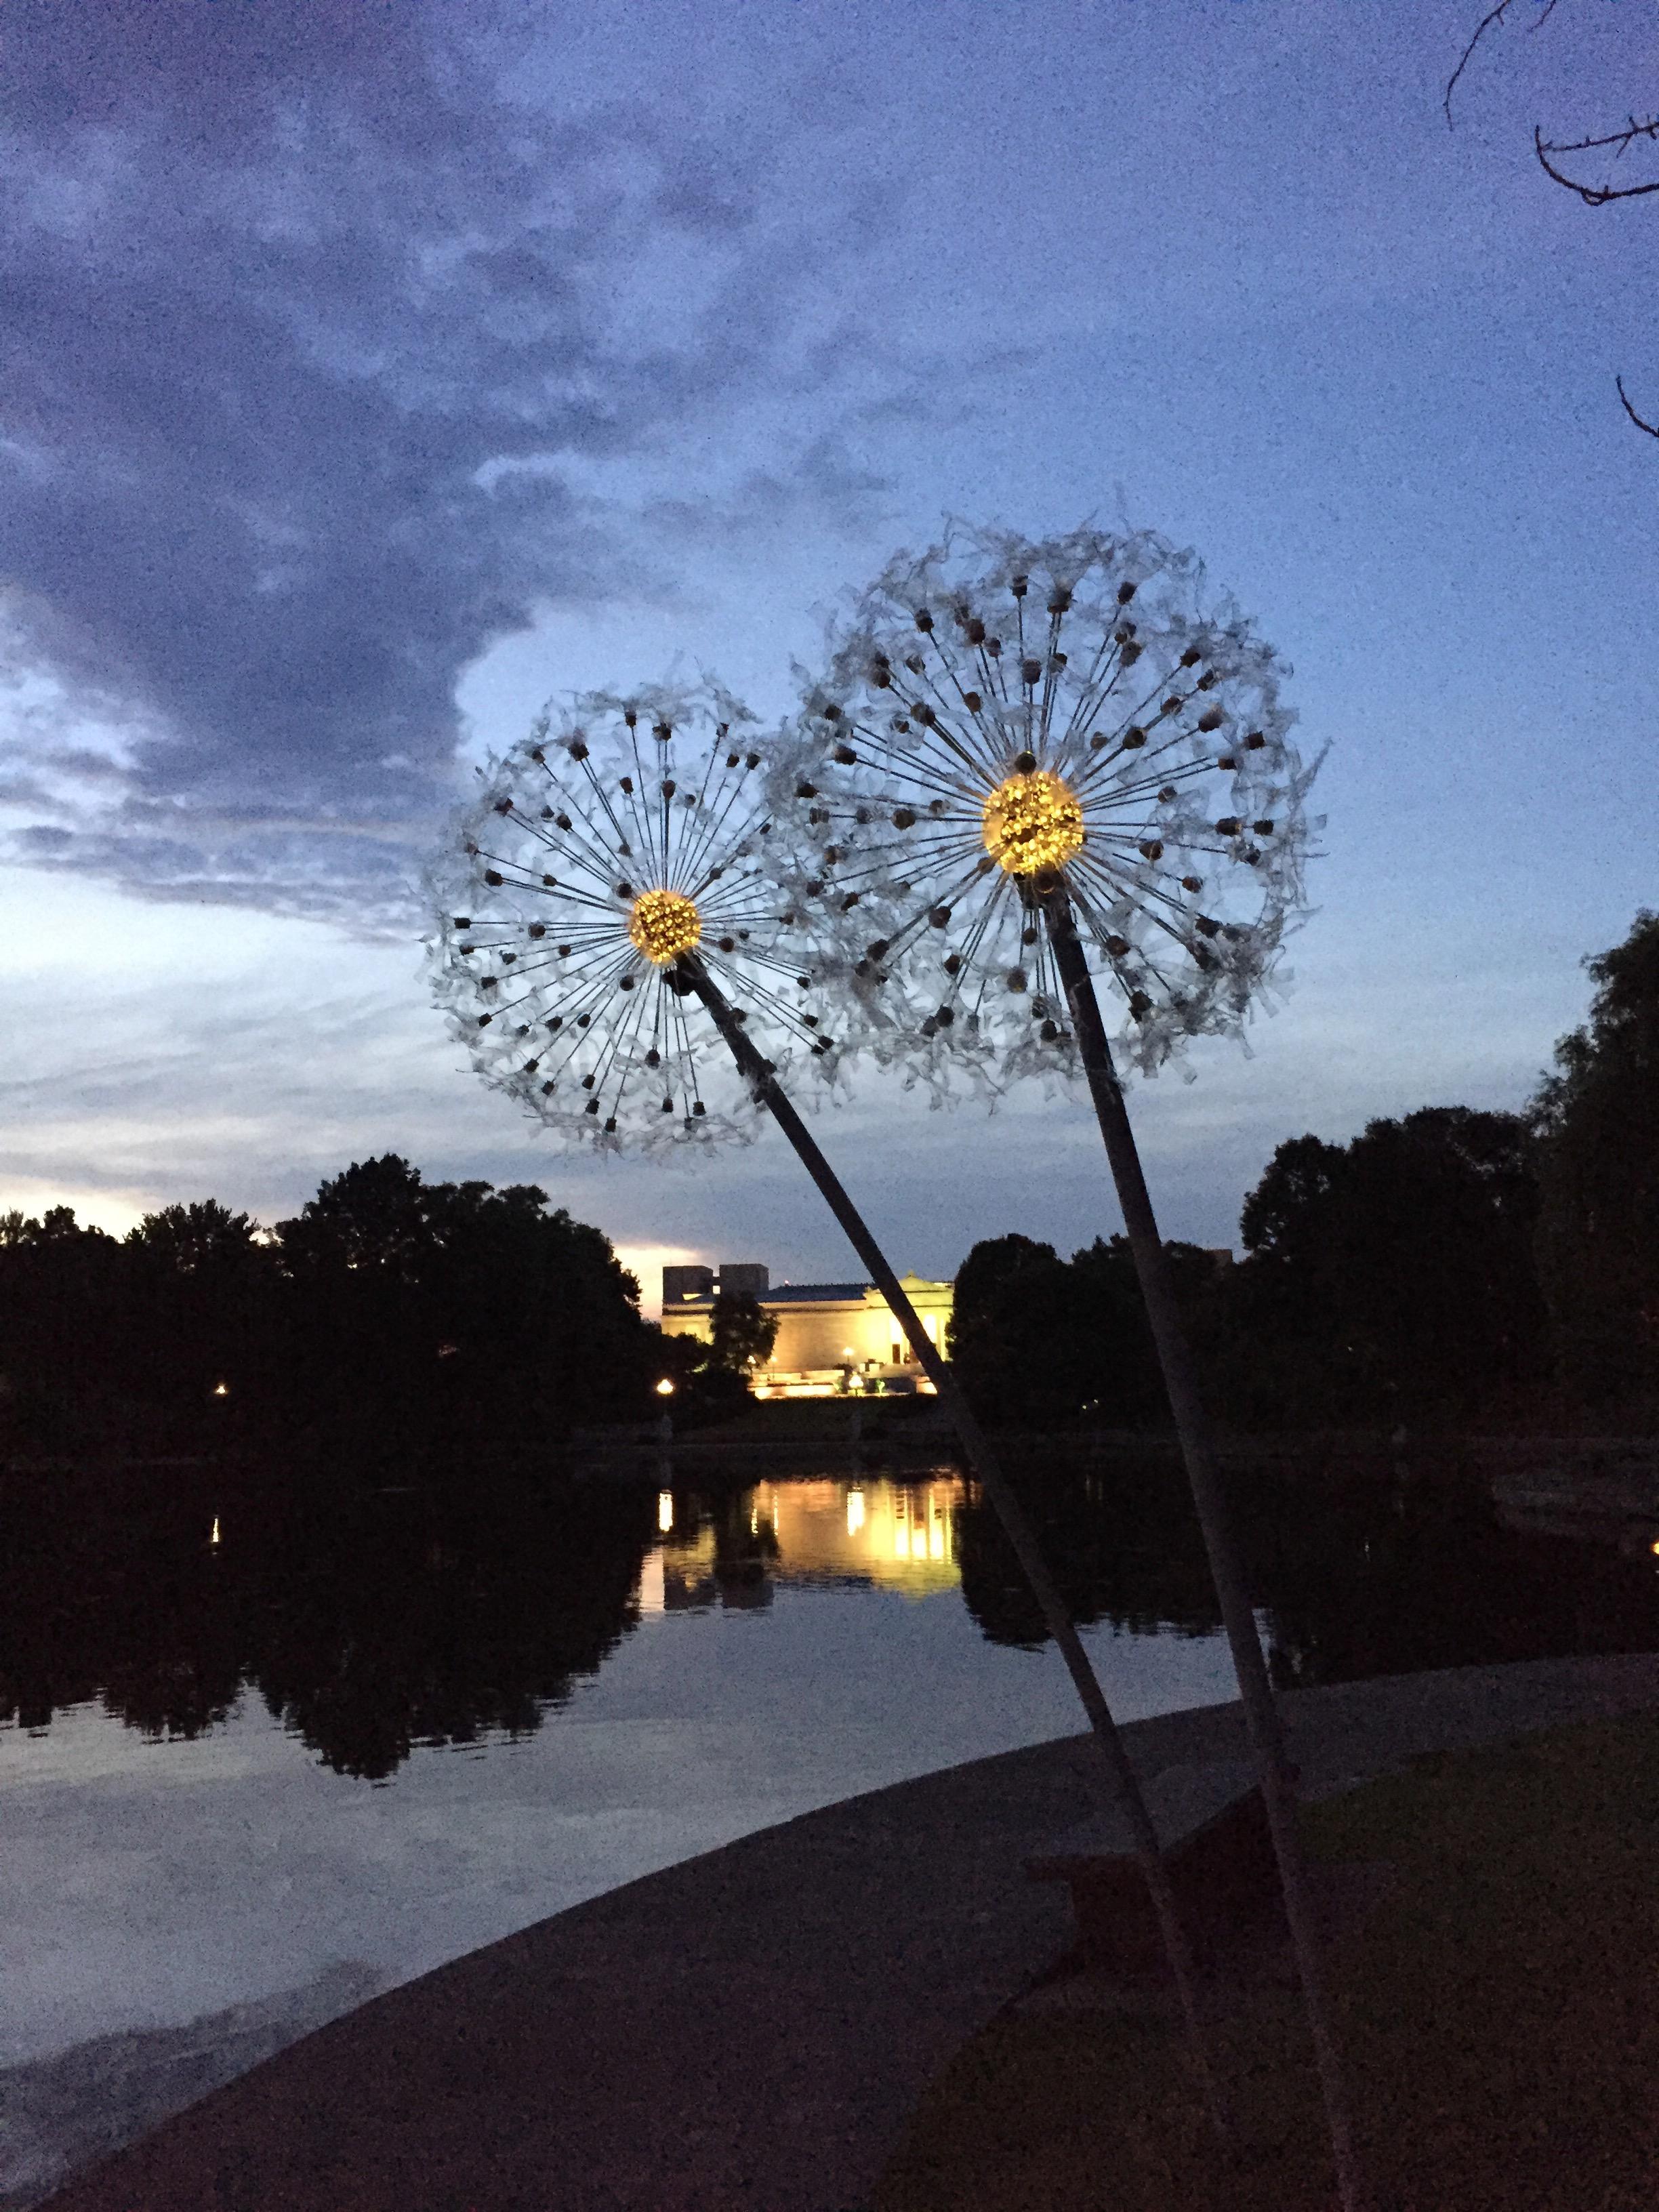 Dandelions, Year